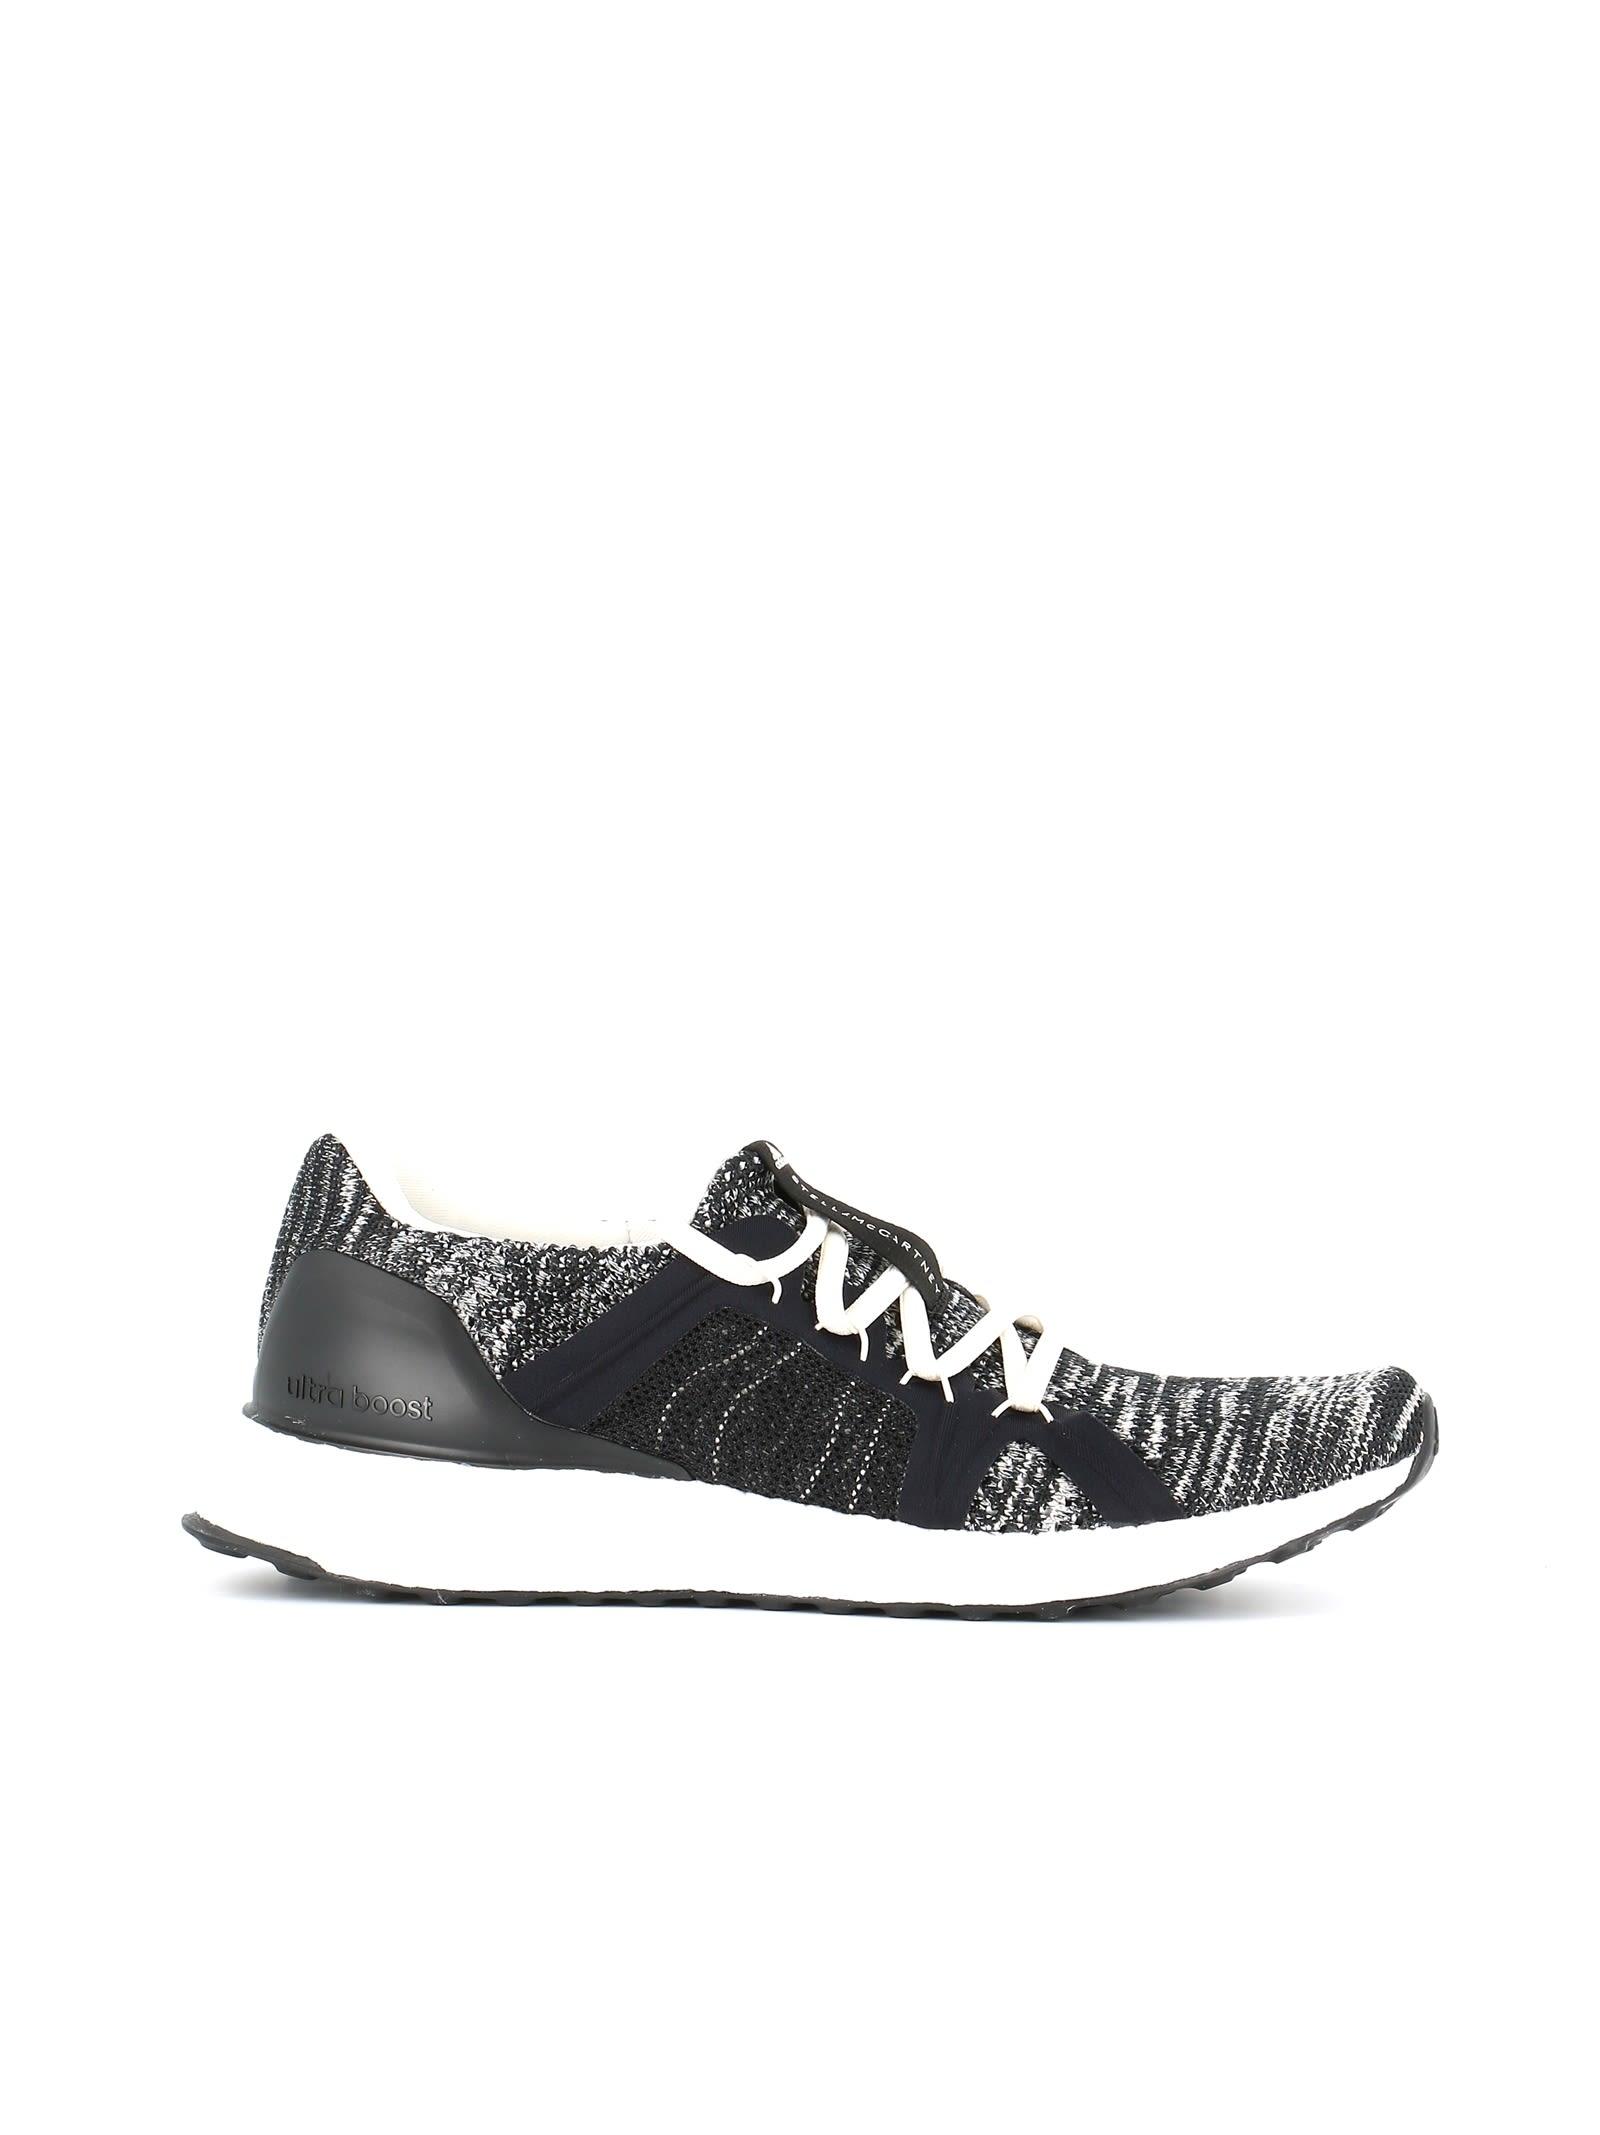 6dfe78f28 Adidas by Stella McCartney Sneaker